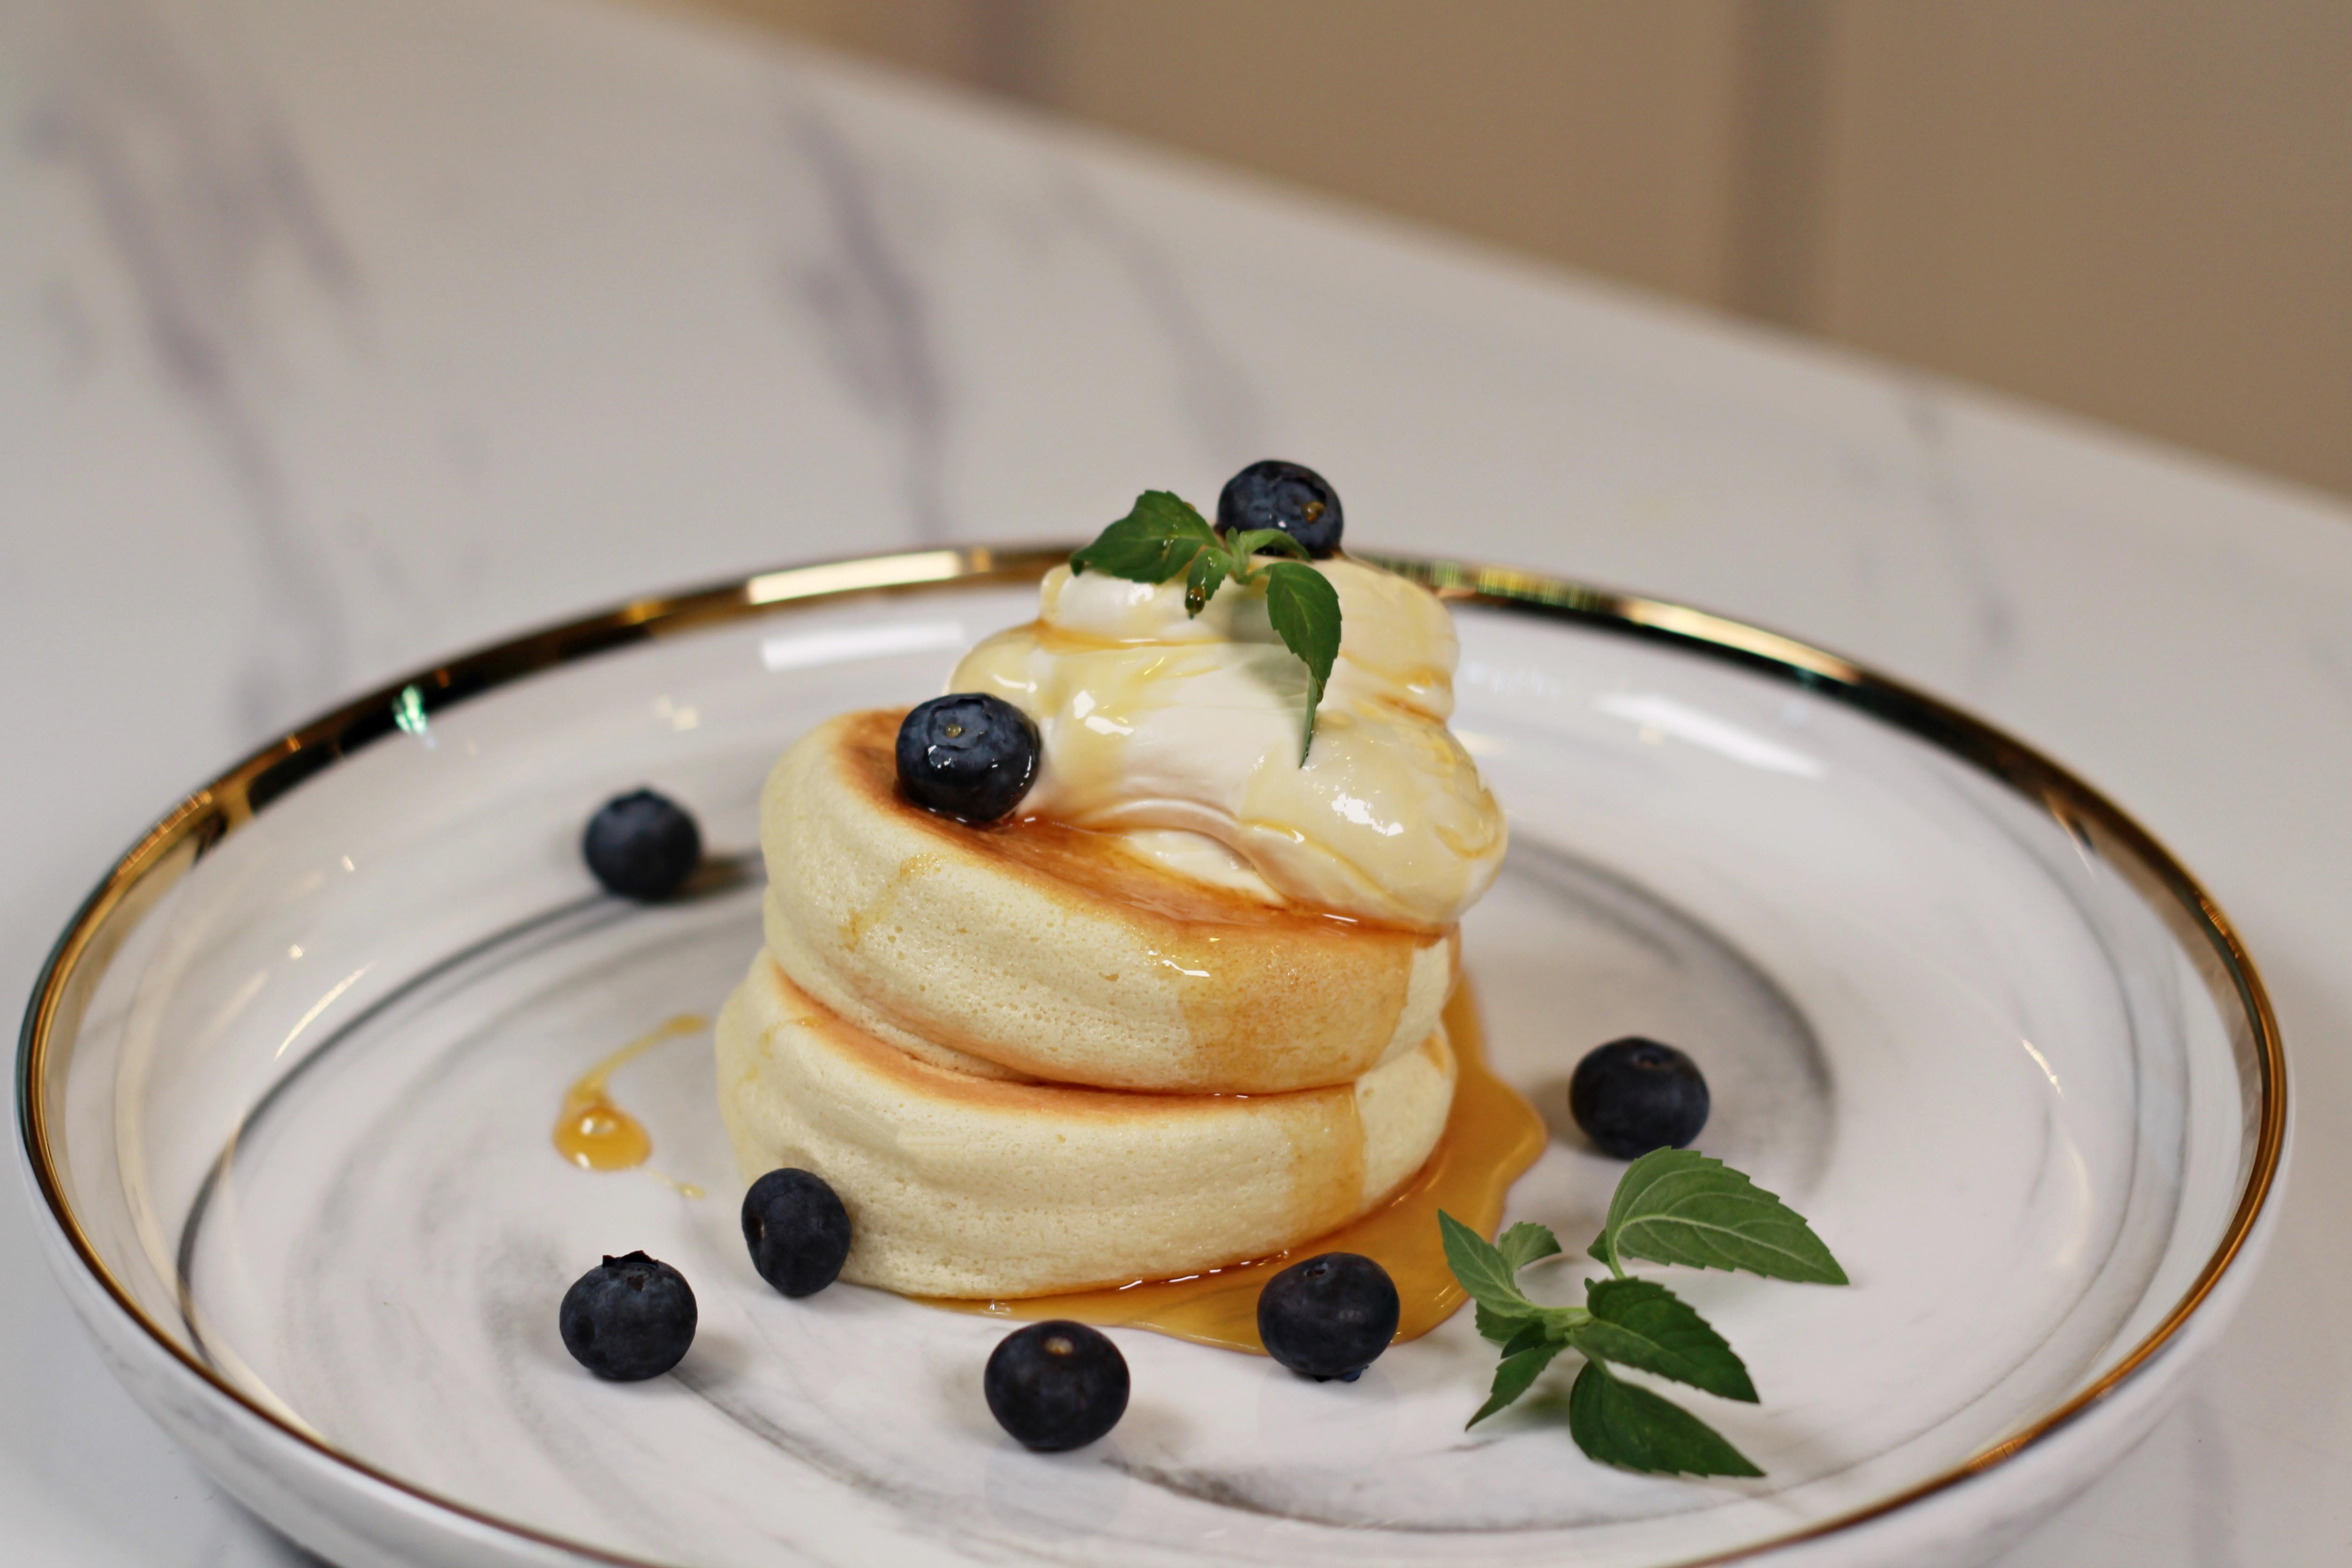 Souffle Pancakes スフレパンケーキ